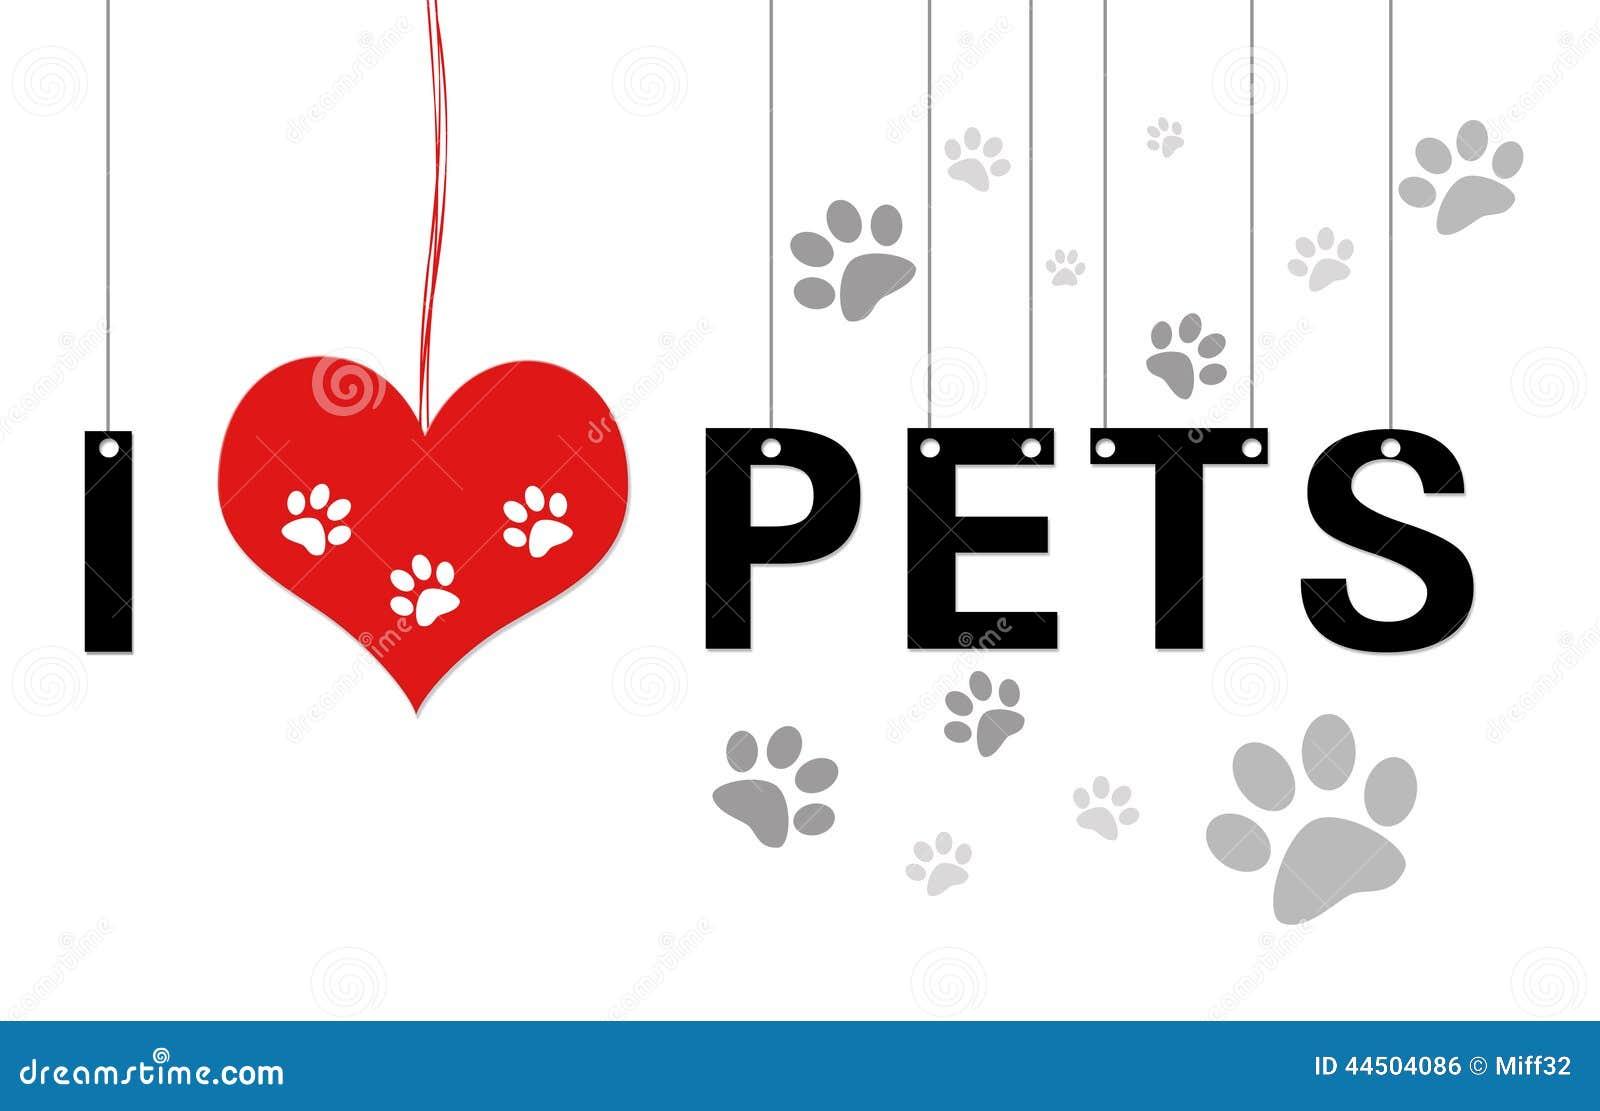 Love Pets Stock Illustration - Image: 44504086